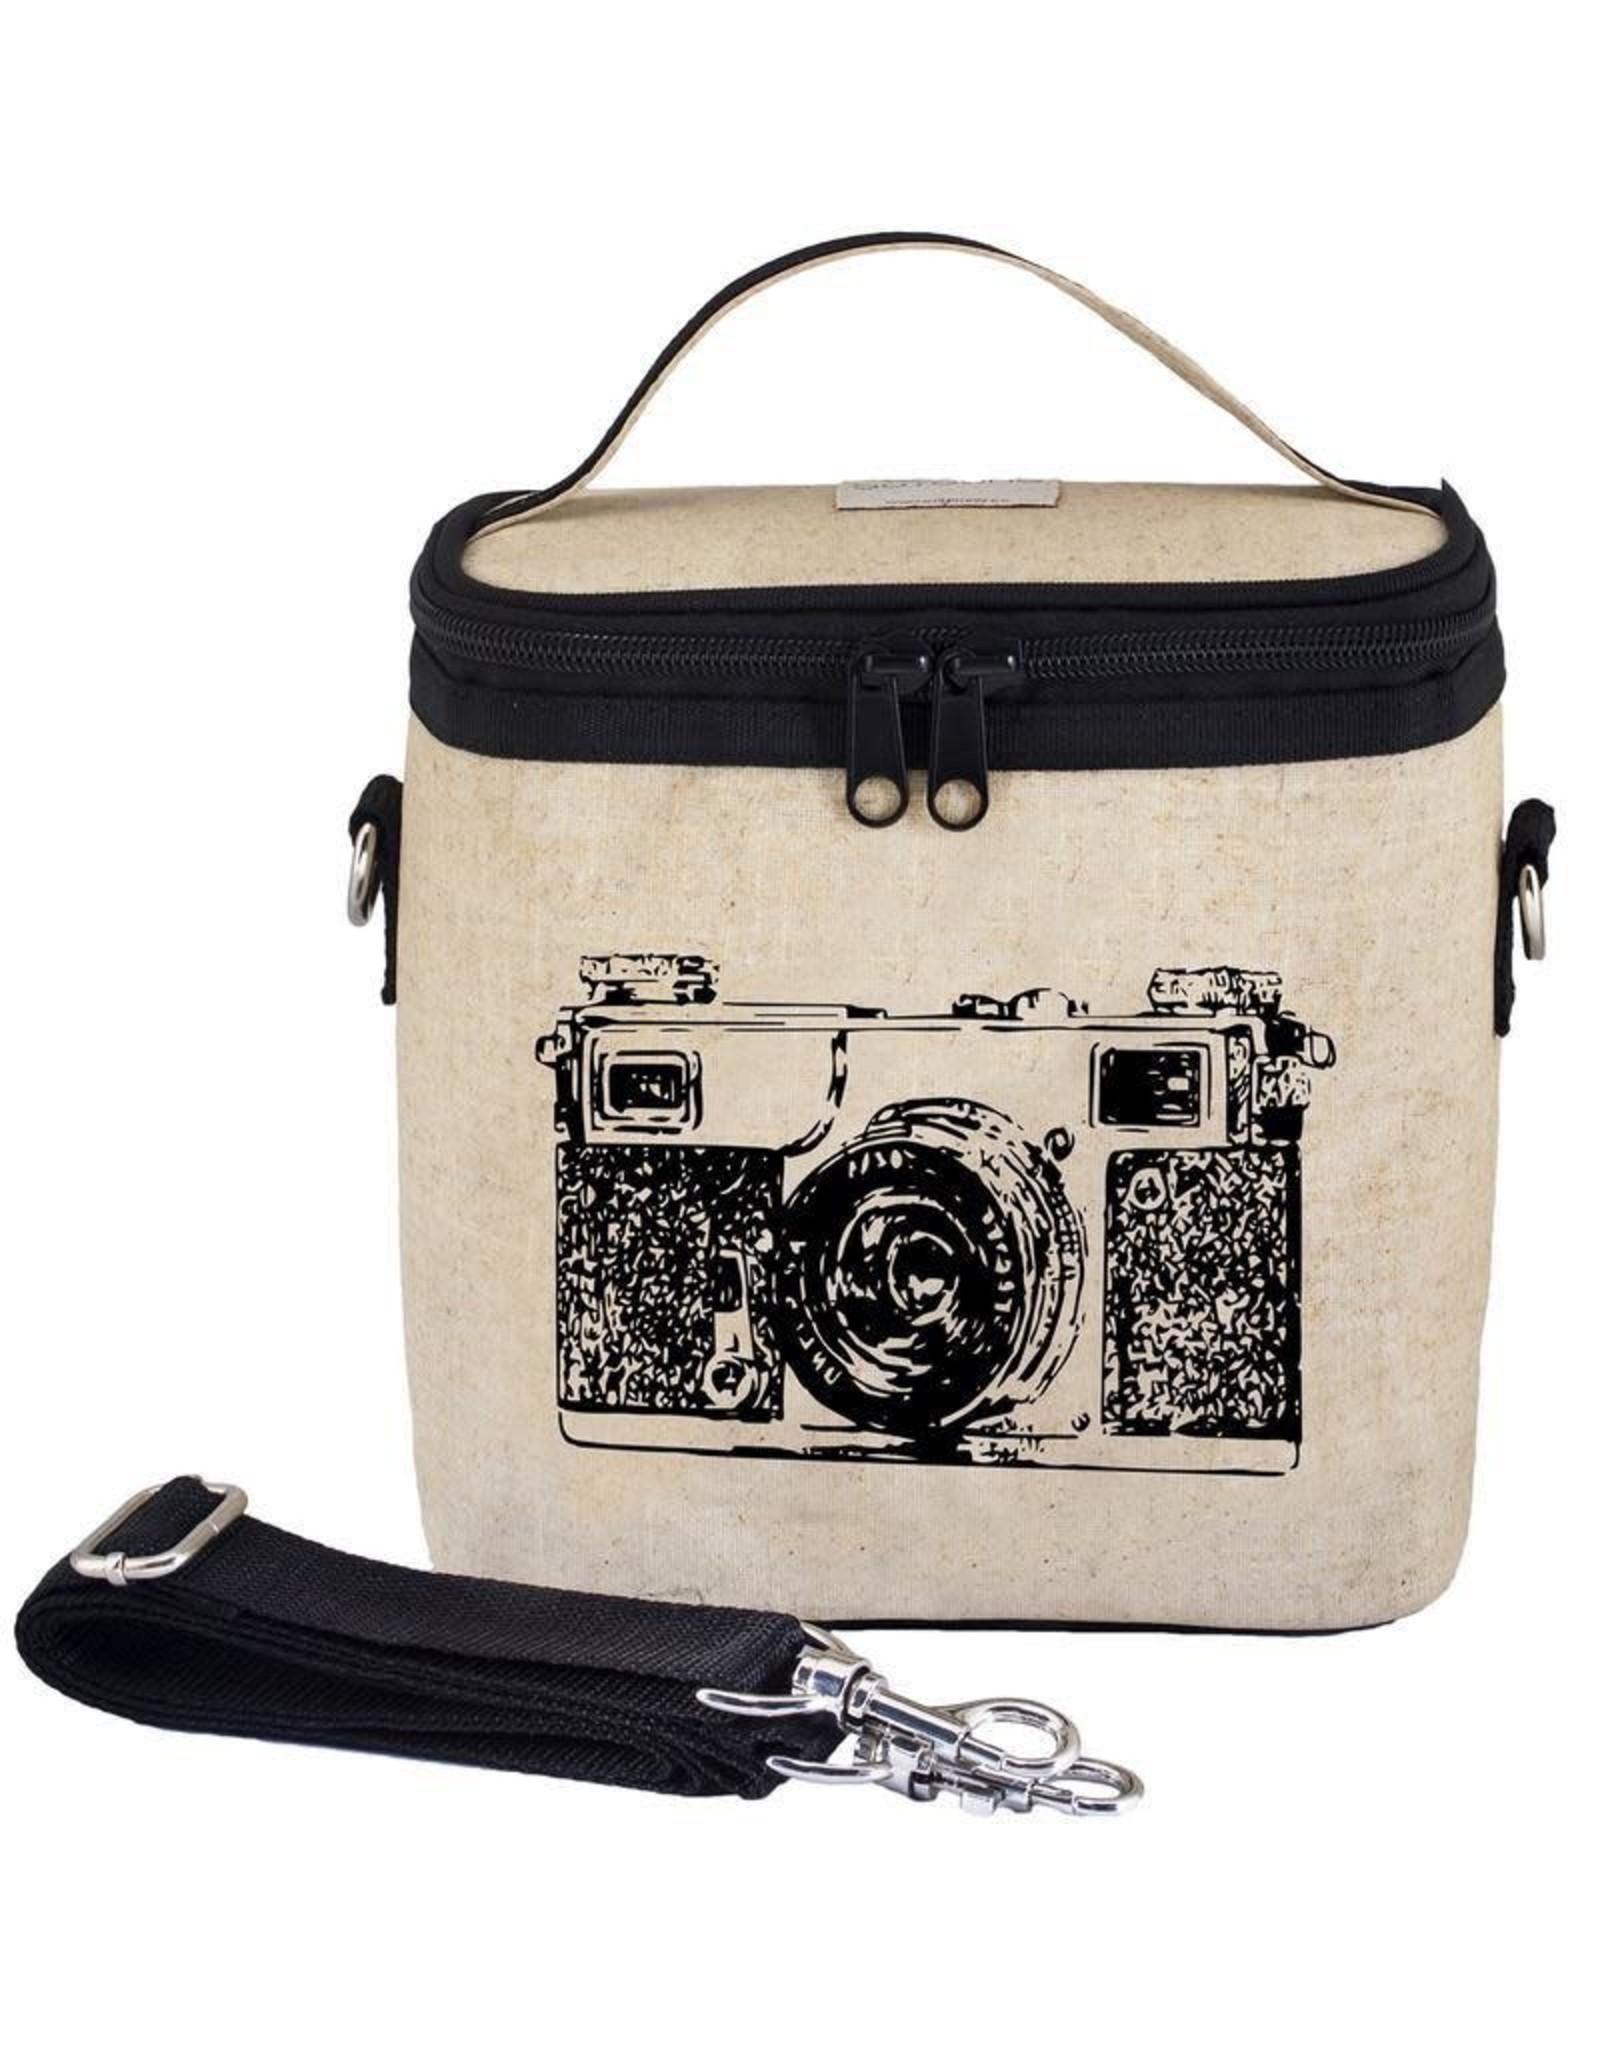 SoYoung So Young - Black Camera Large Cooler Bag